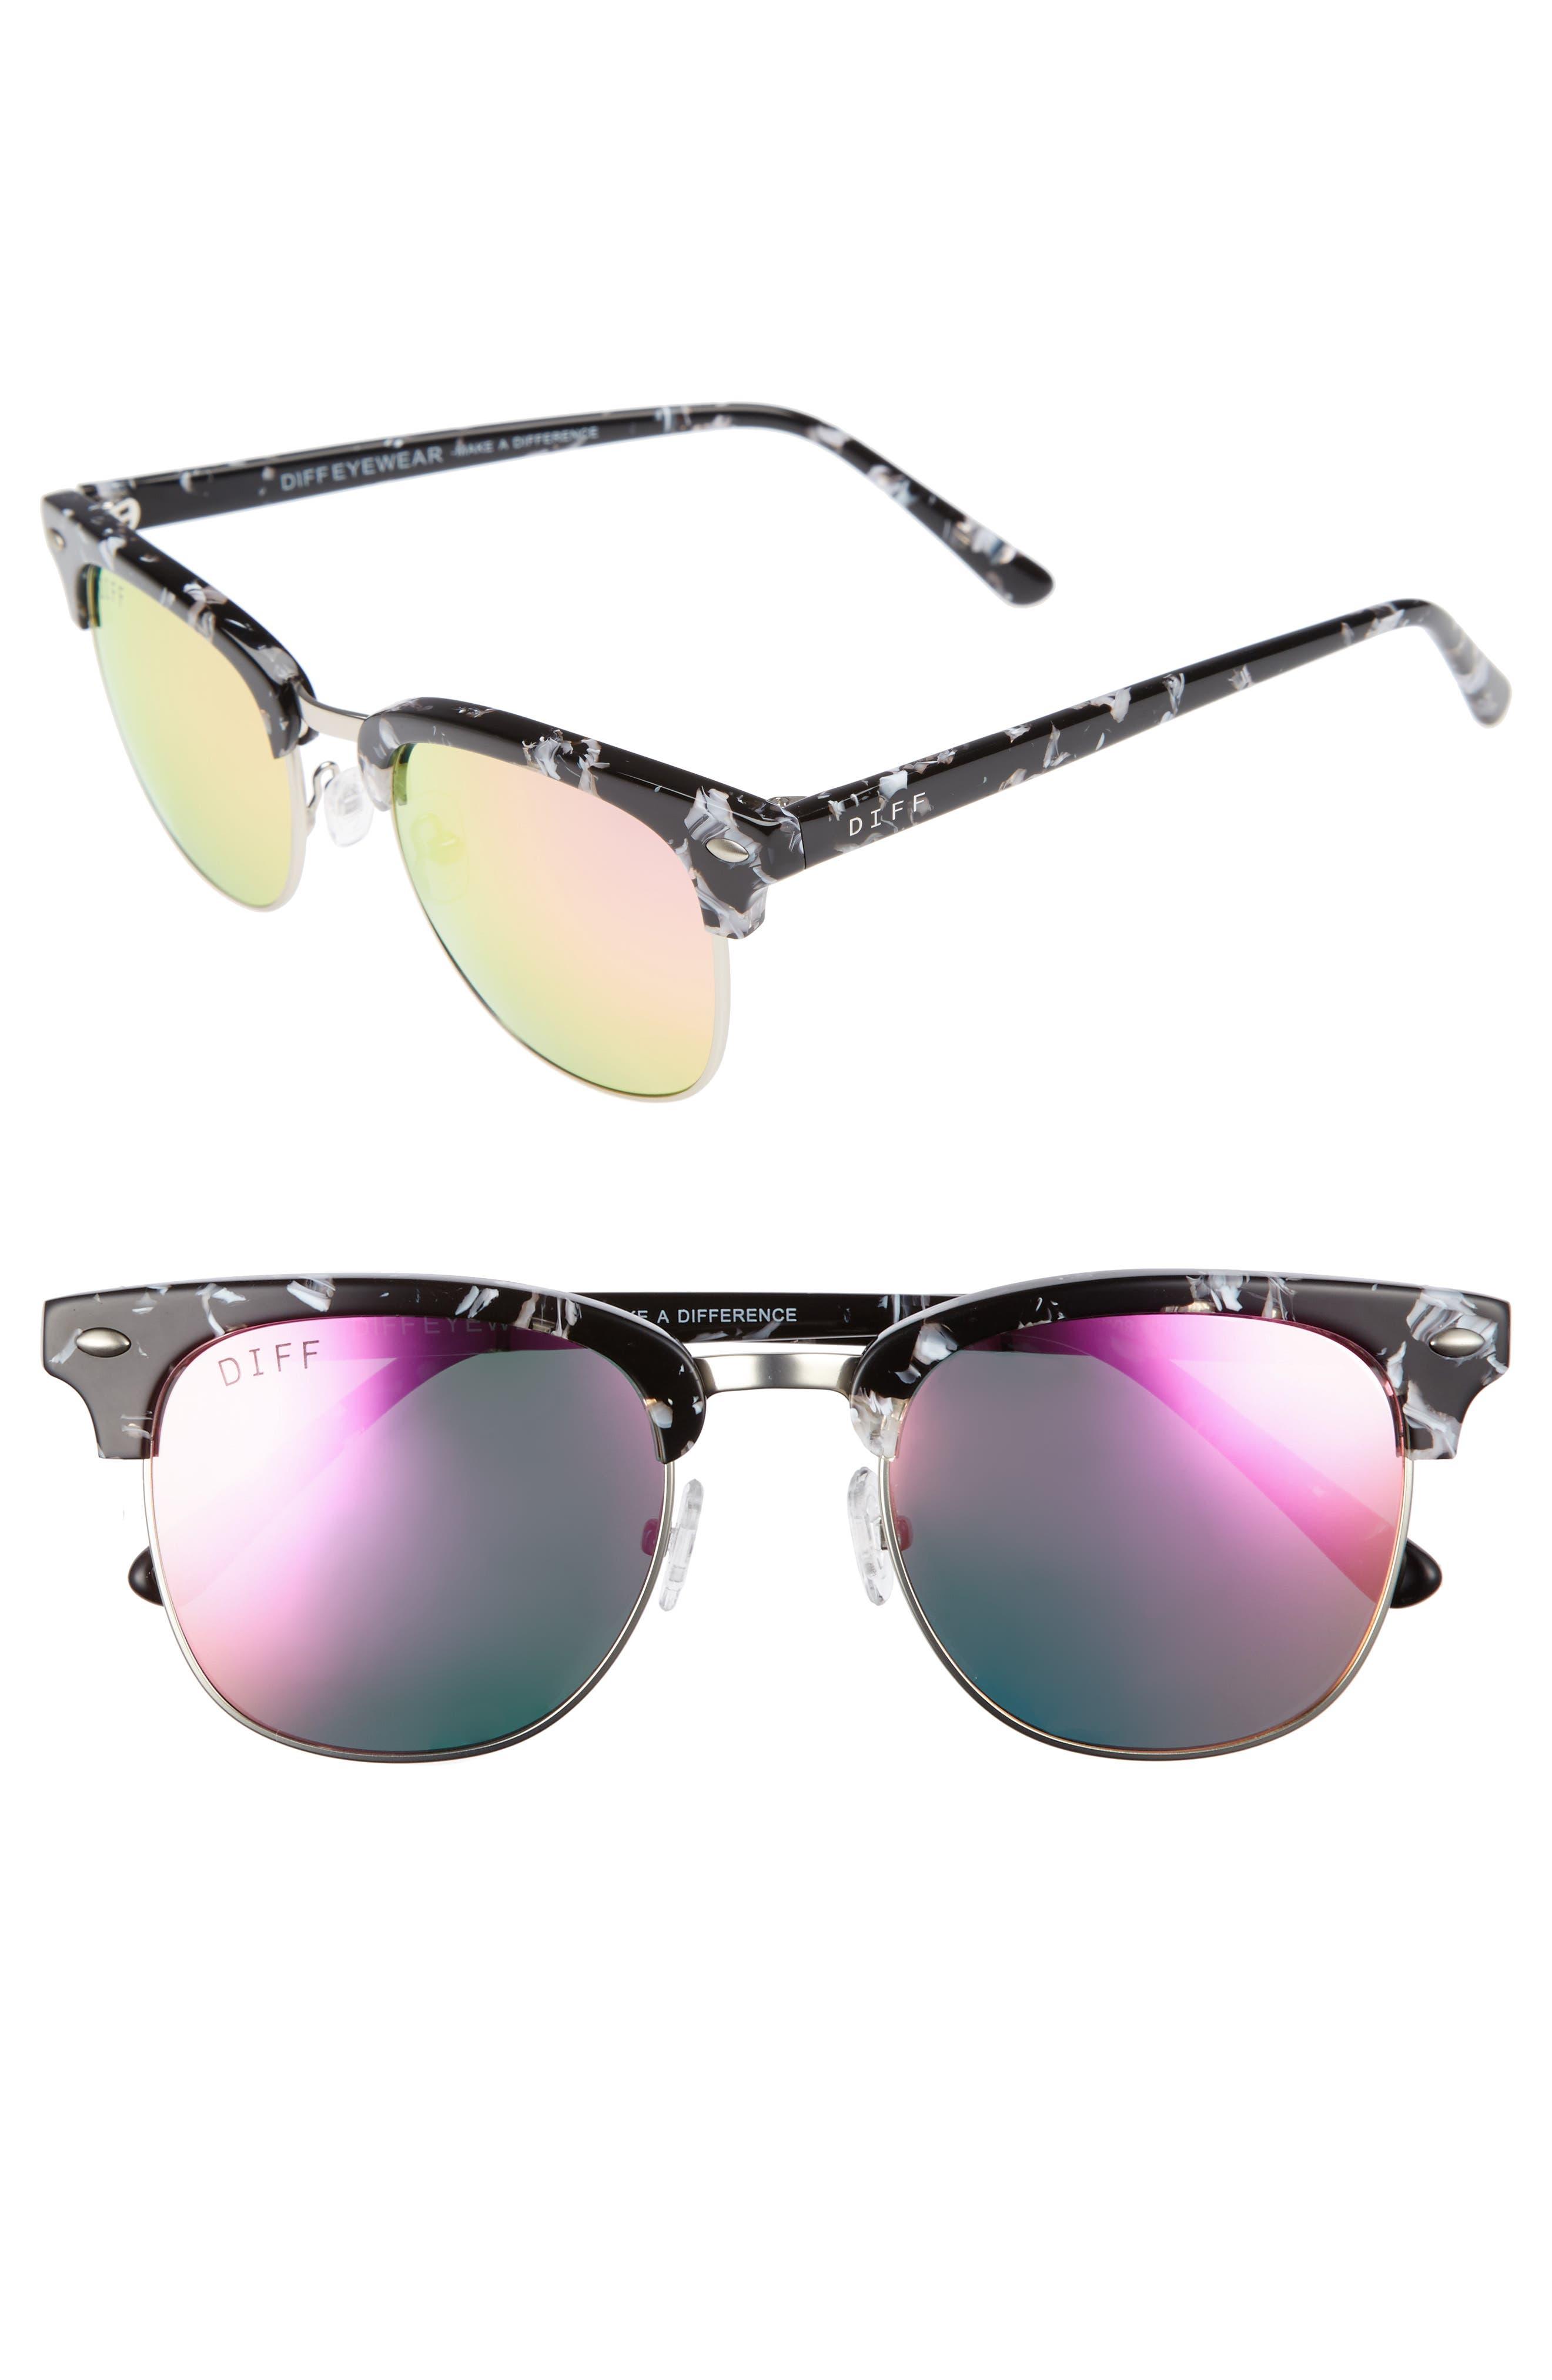 DIFF Barry 51mm Polarized Retro Sunglasses